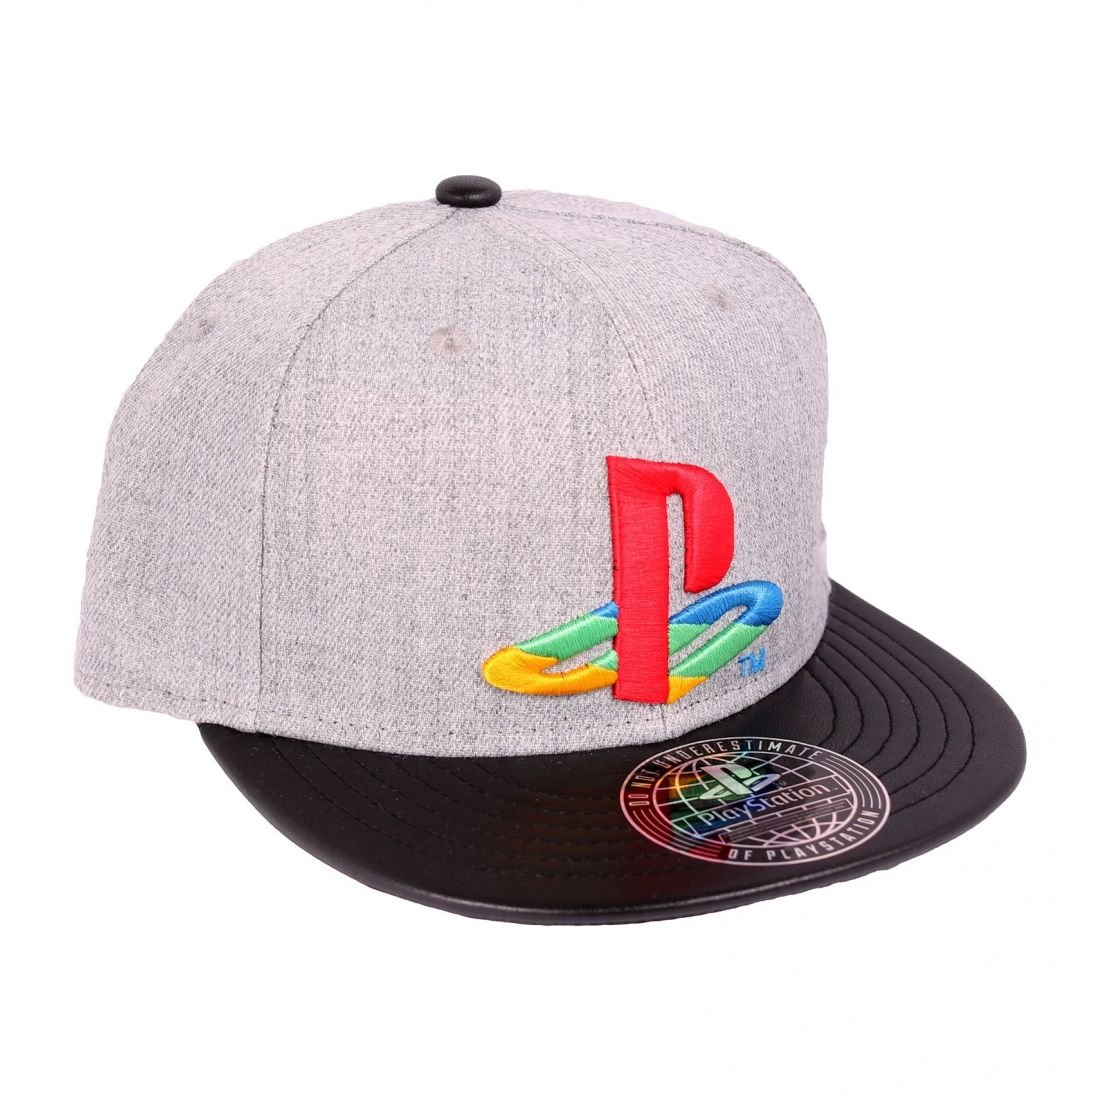 Playstation - Casquette snapback baseball logo - Gris, noir Elbenwald 2909